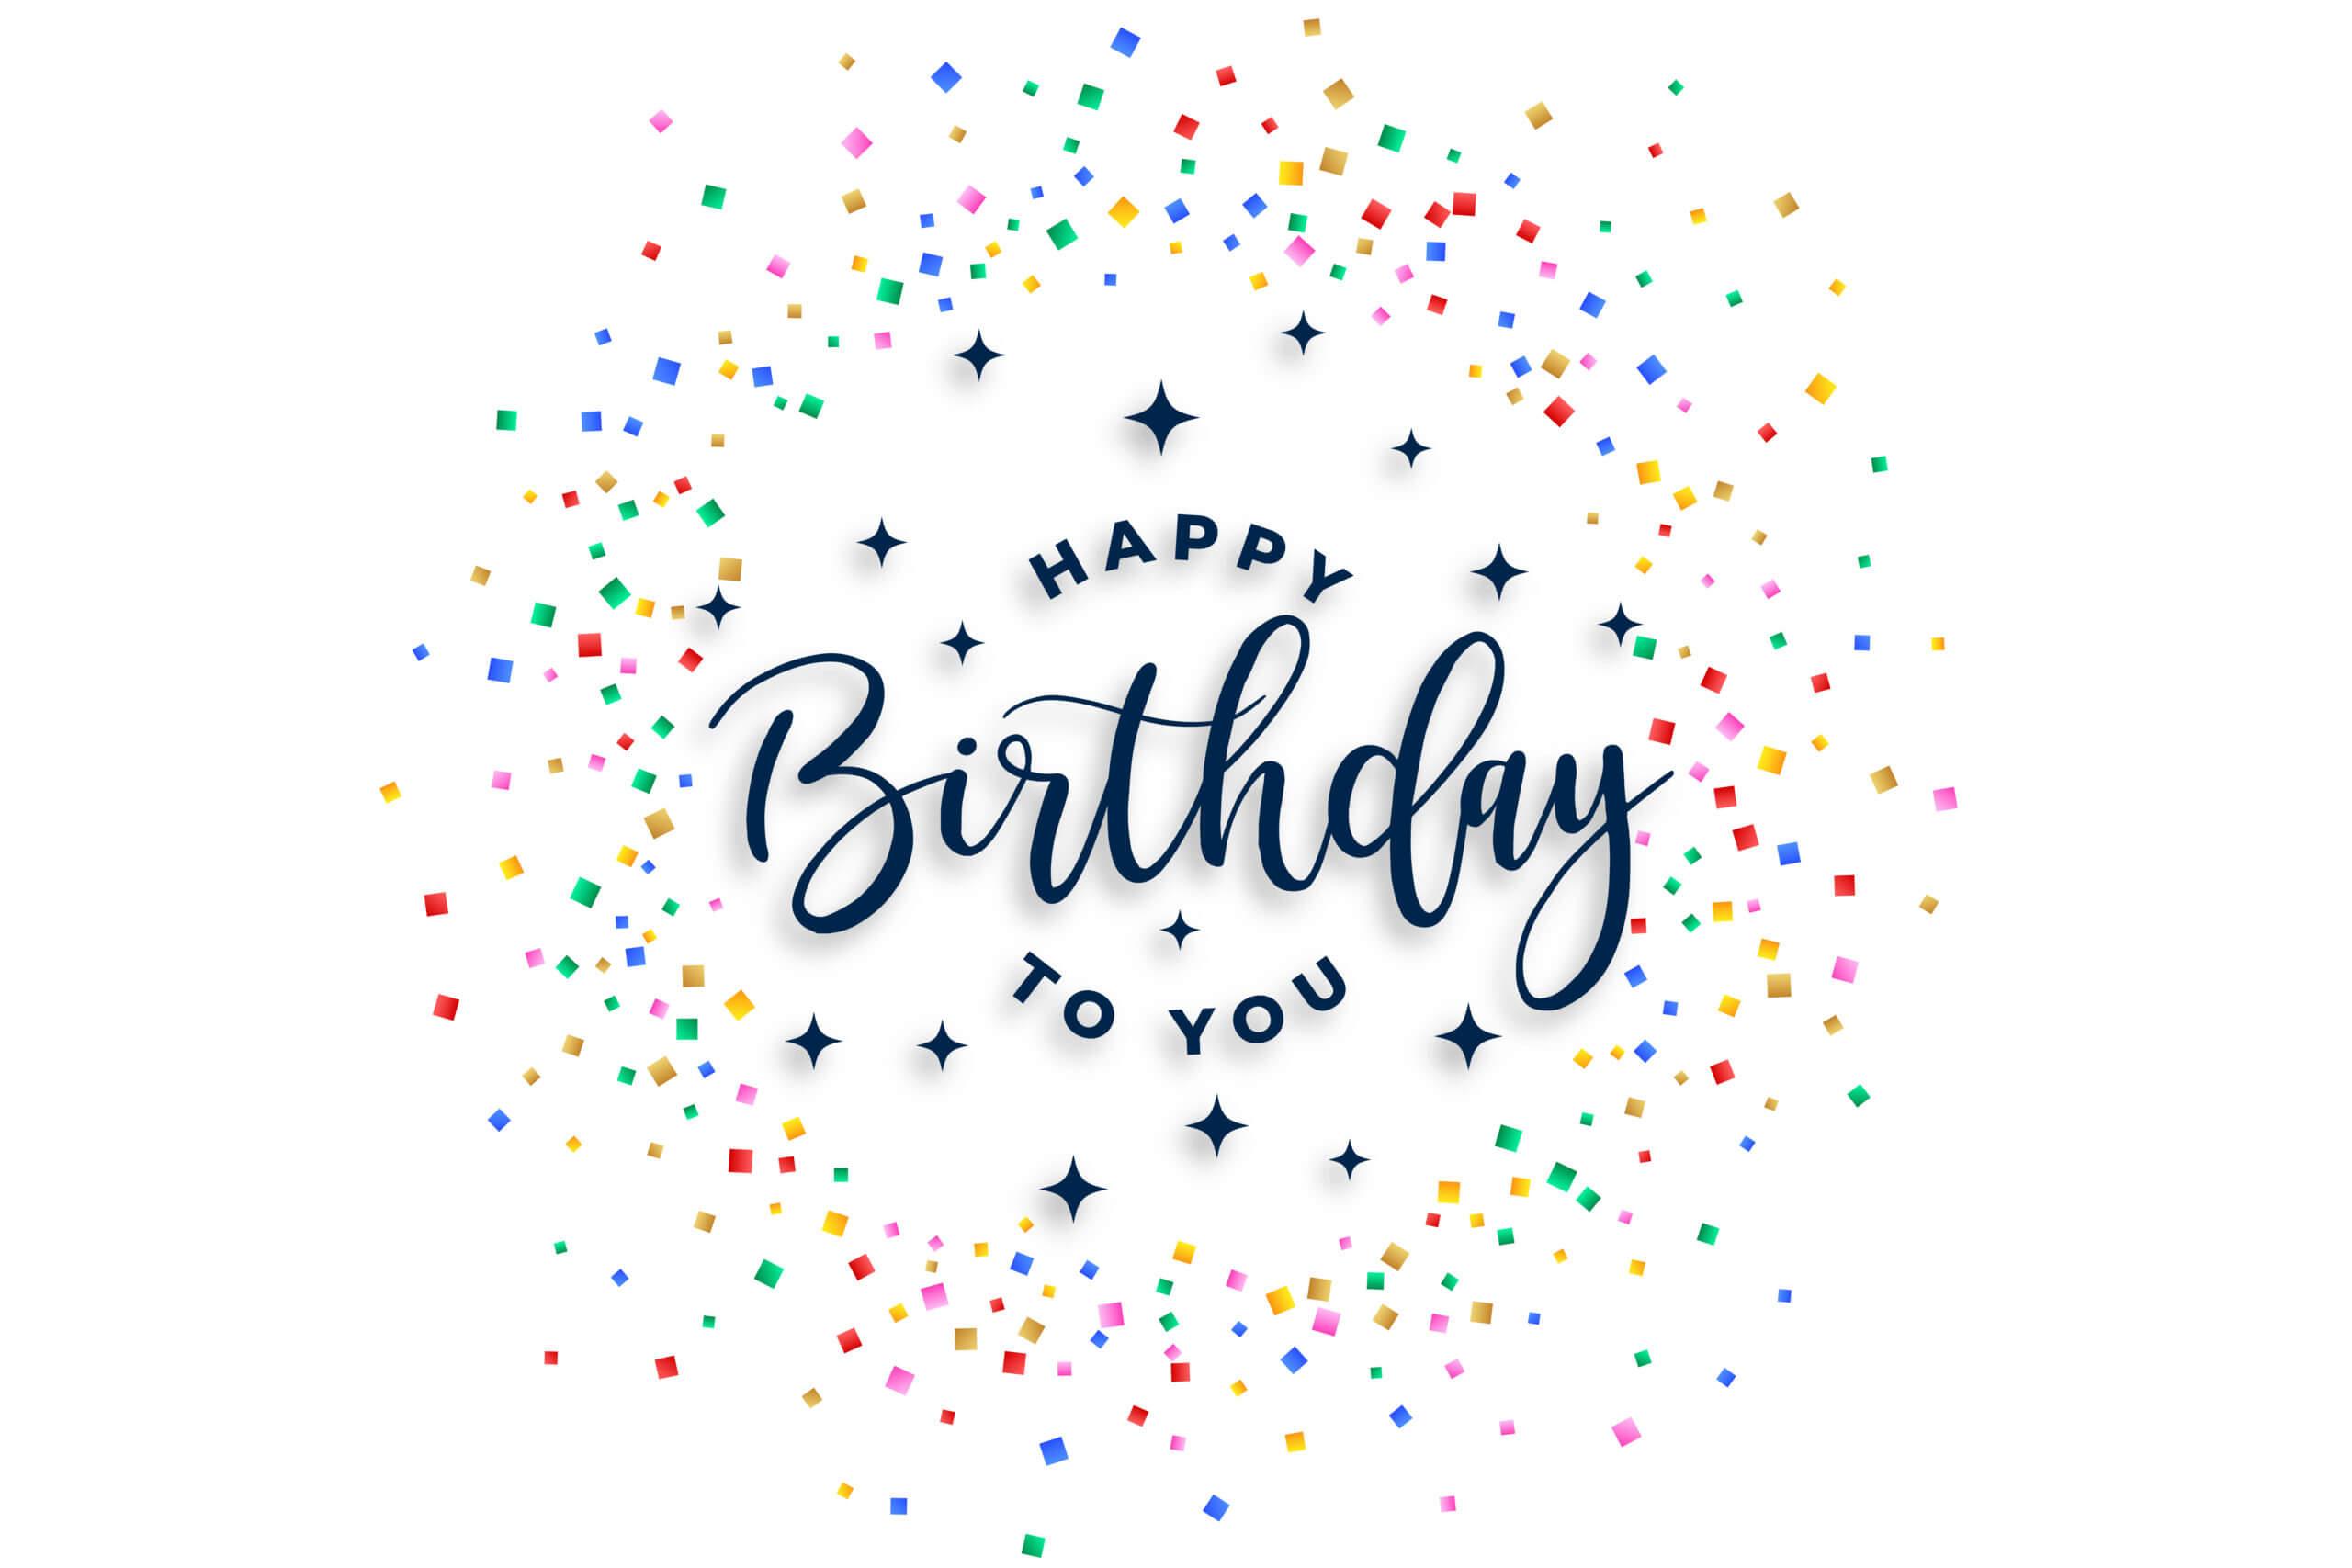 happy birthday to you celebration confetti background design